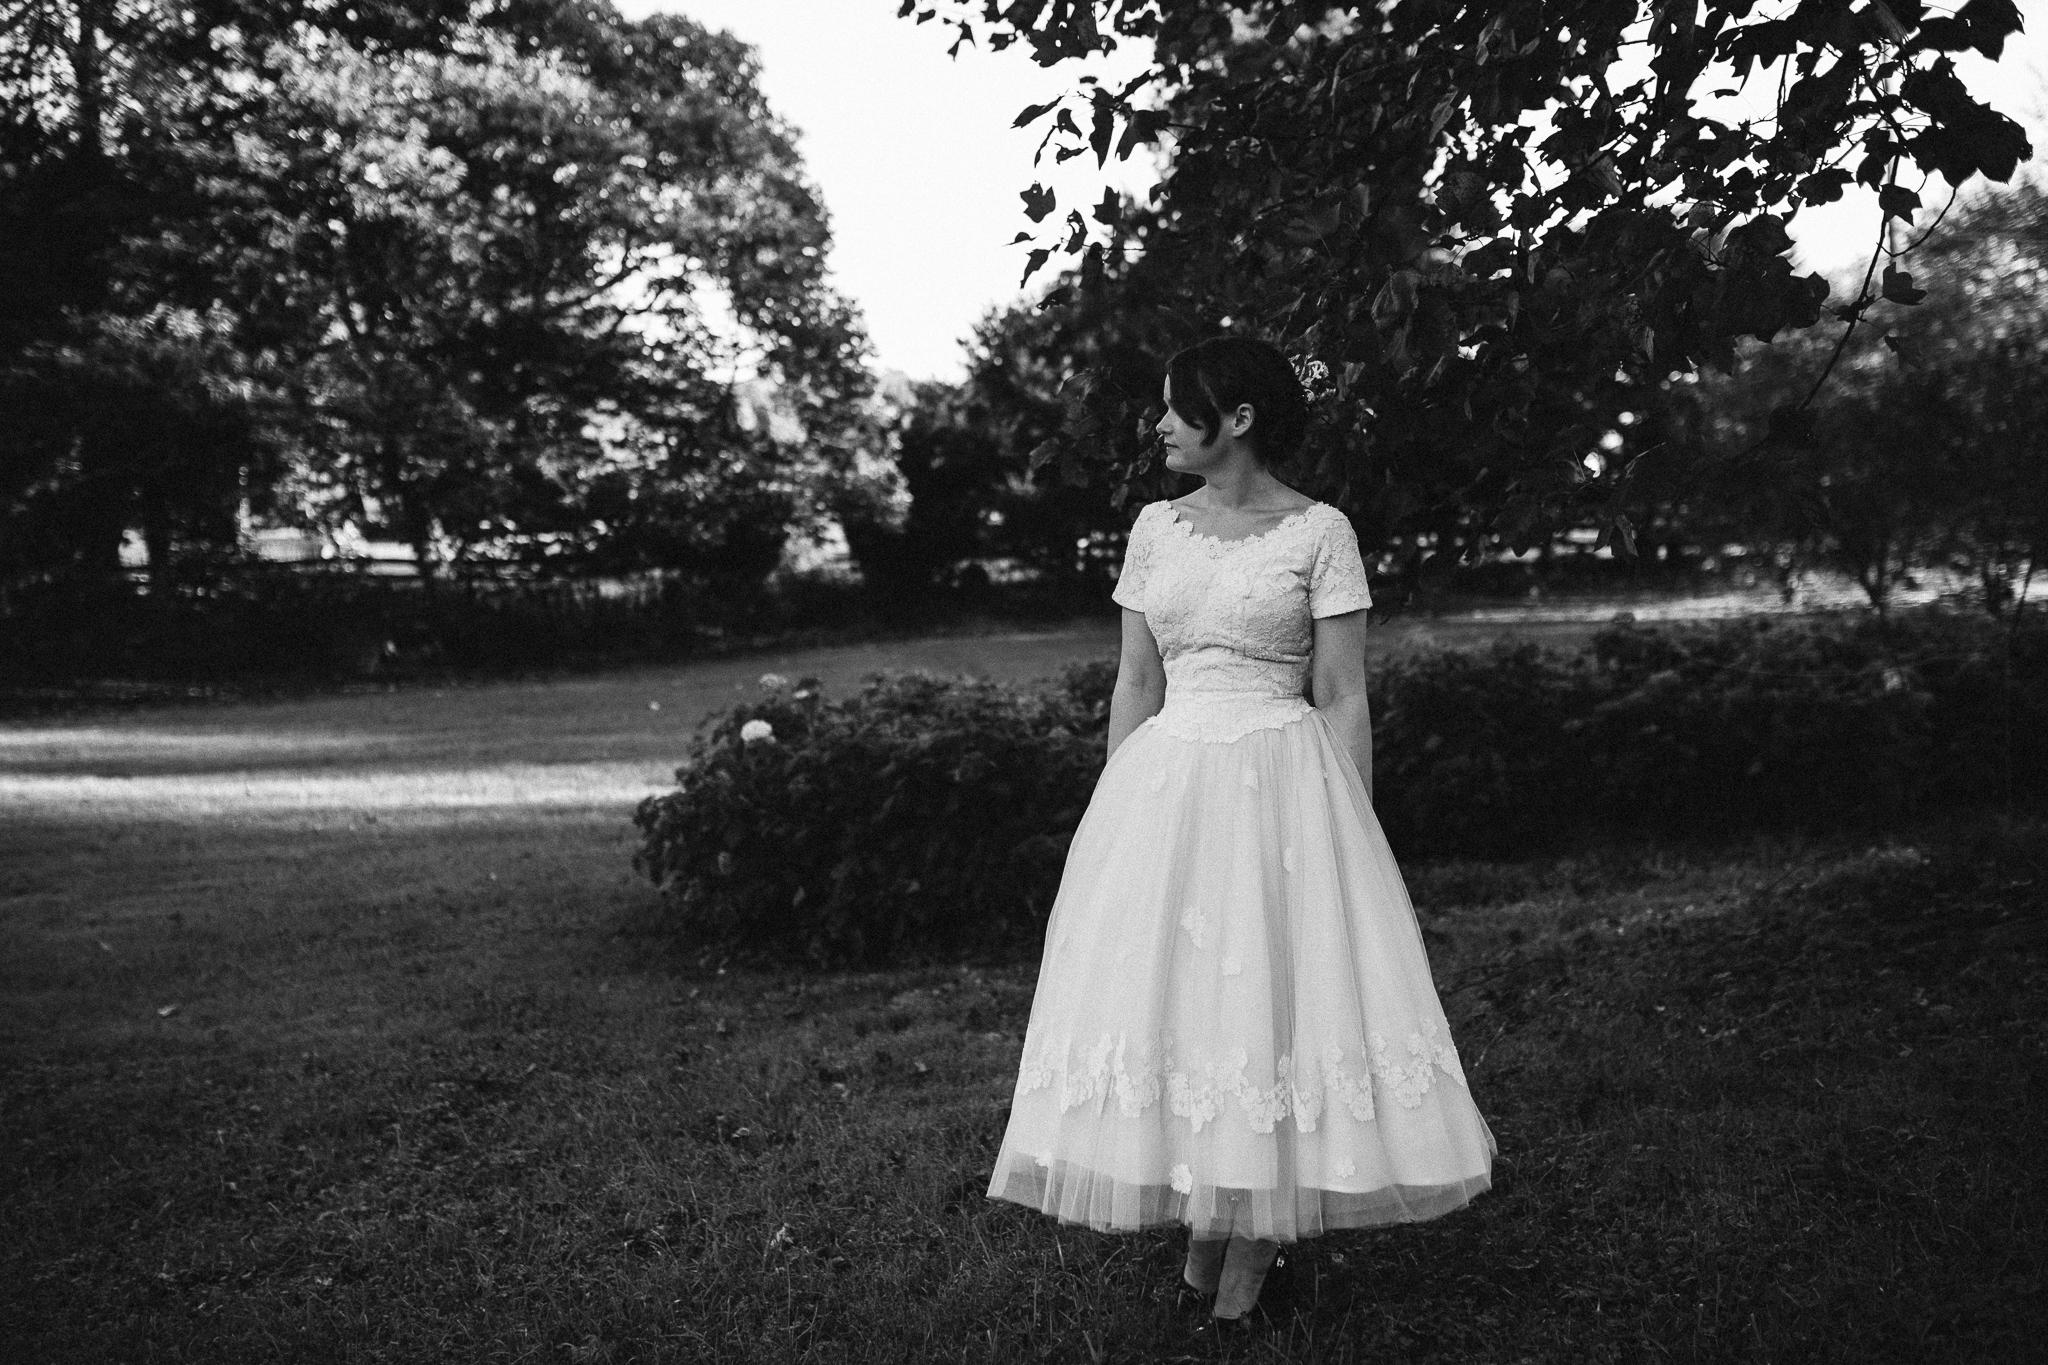 Wollam_gardens_wedding42.JPG